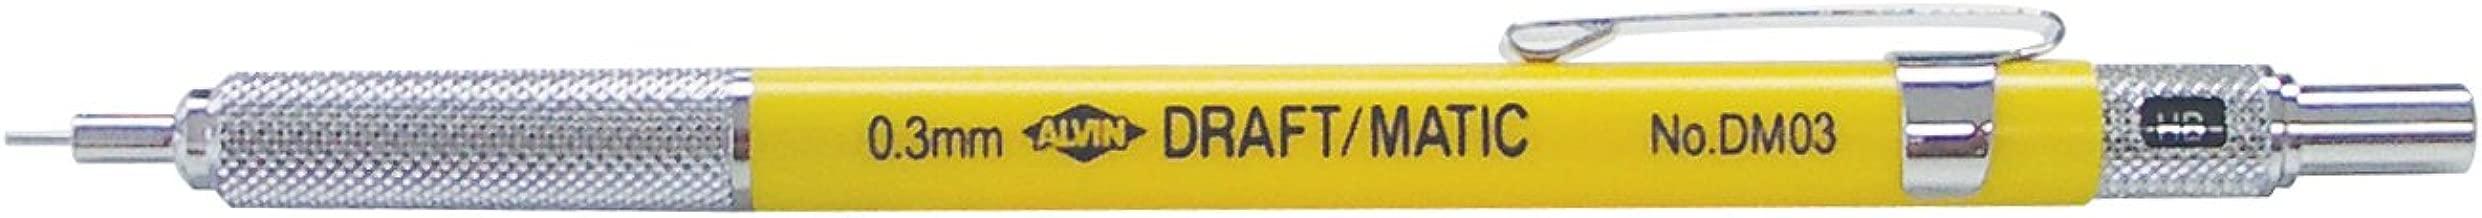 Alvin, Draft-Matic Mechanical Pencil, 0.3mm